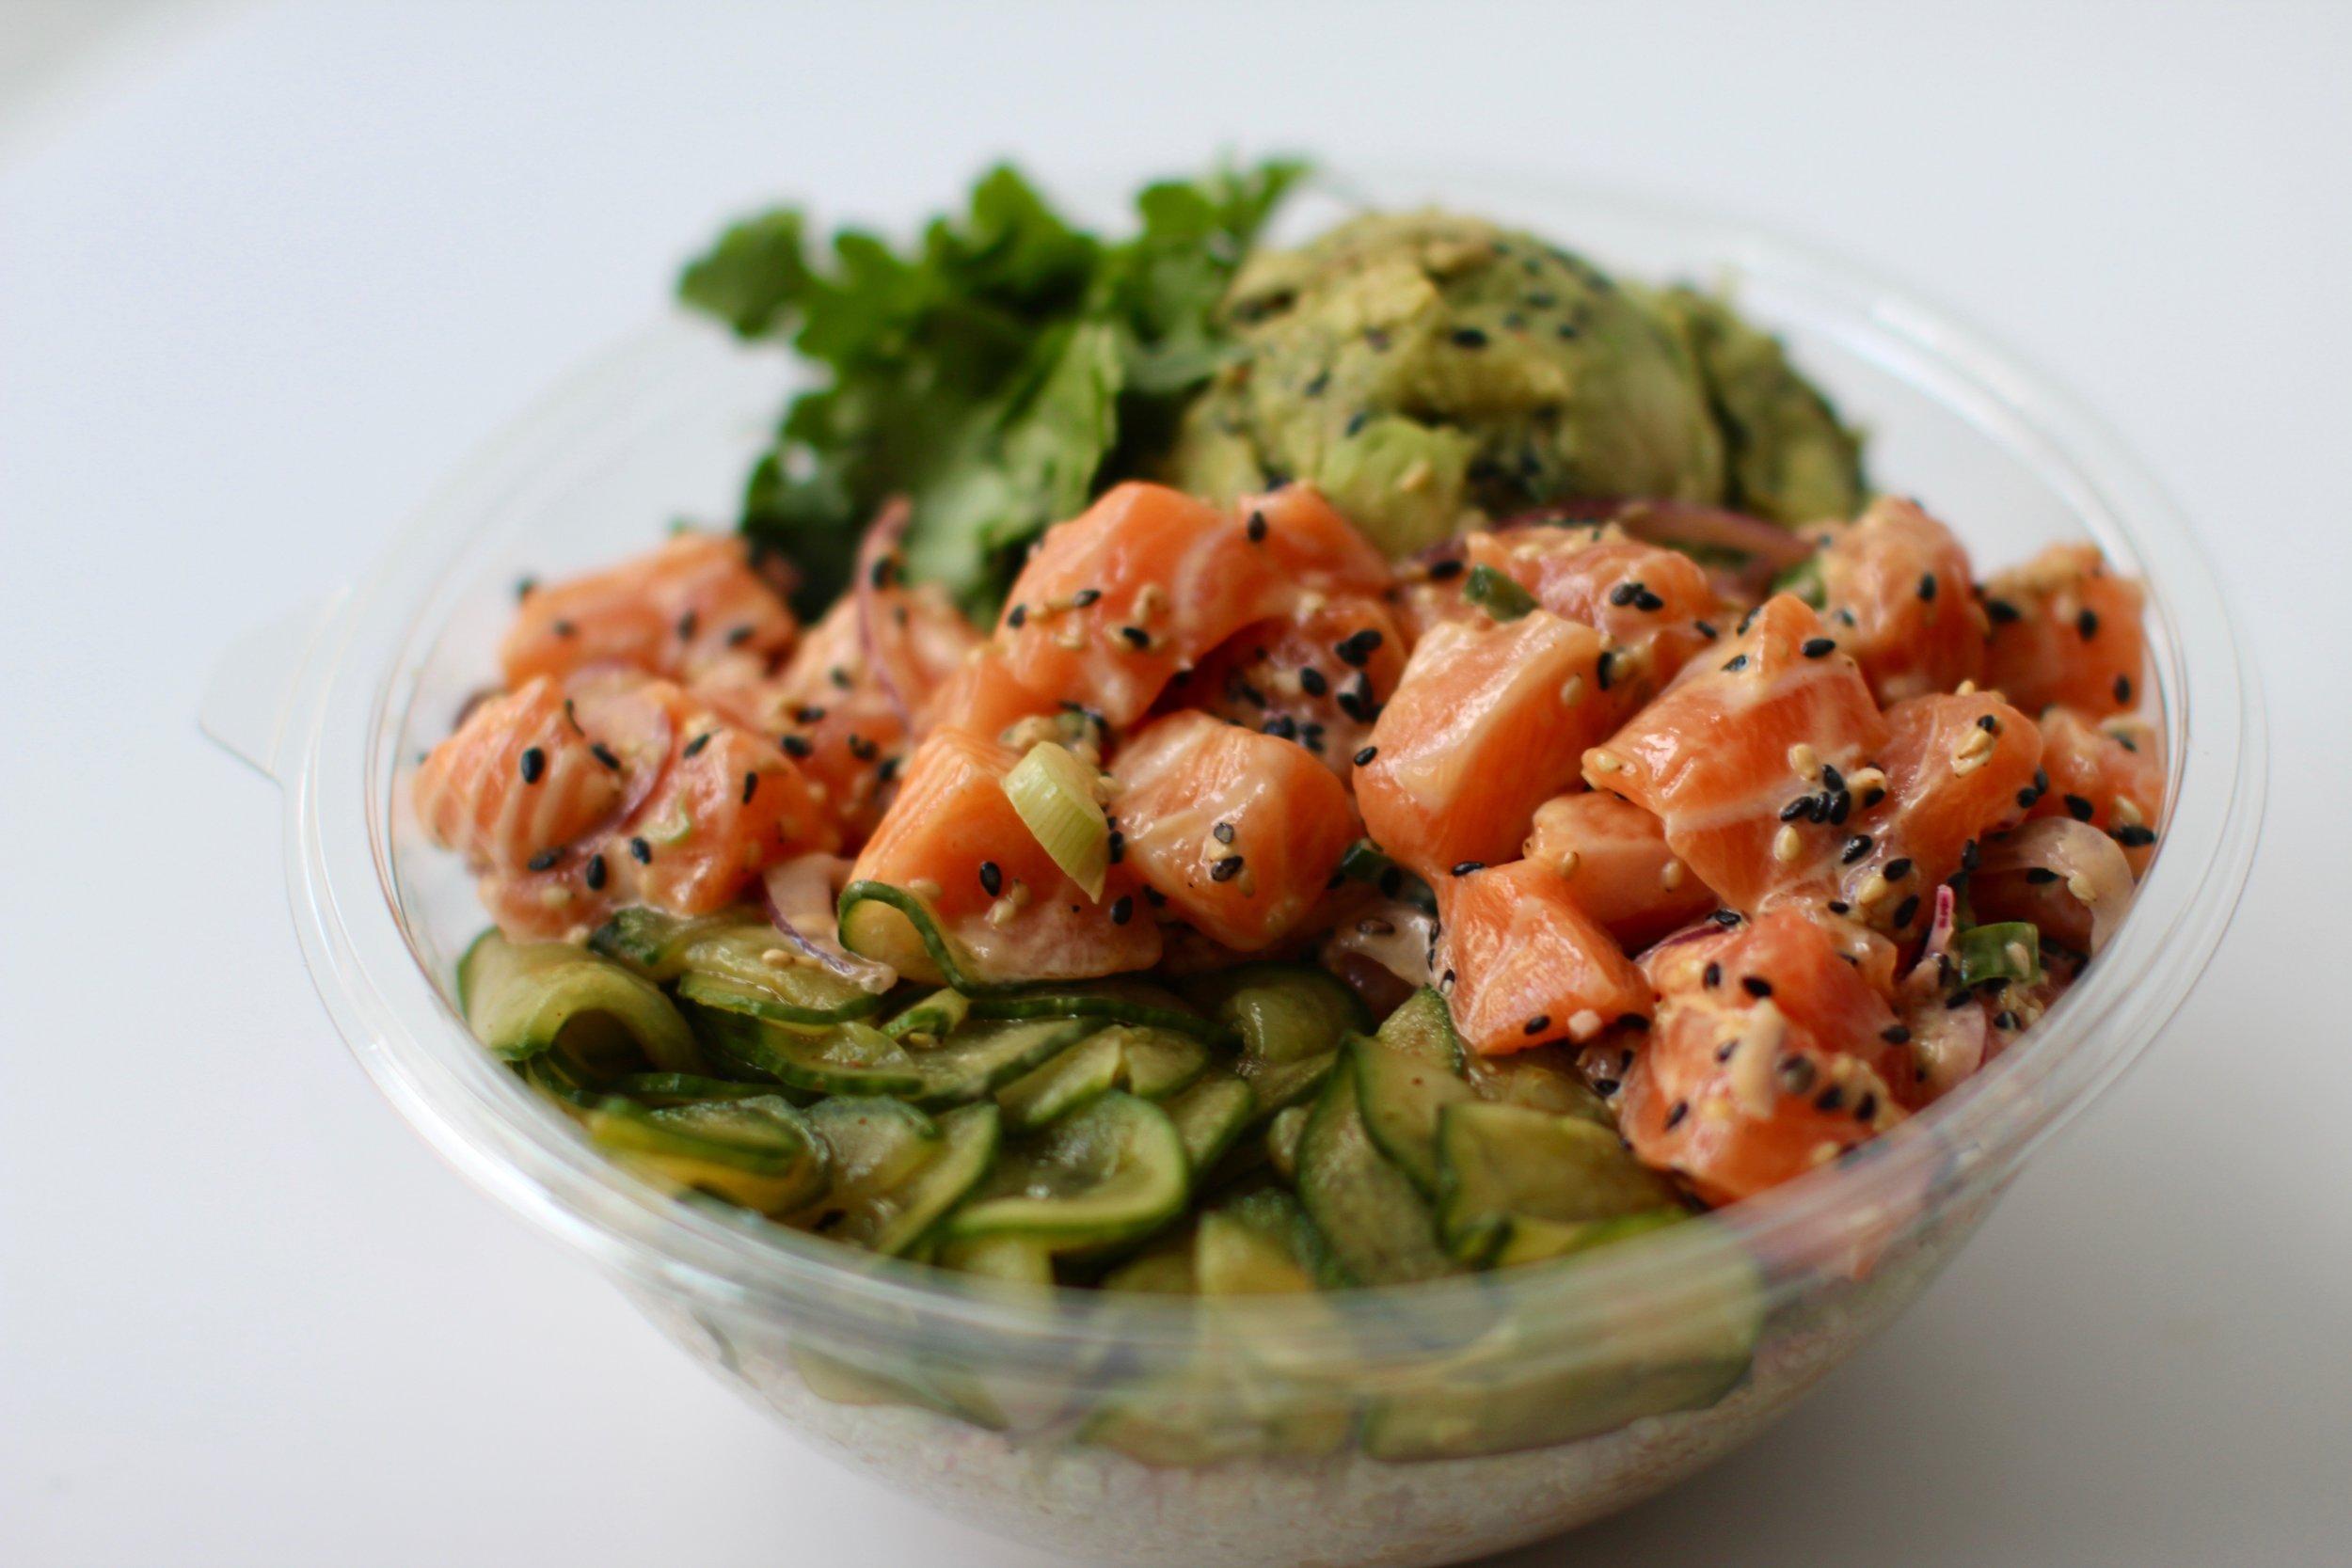 Heat Wave - Quinoa, Salmon, Smashed Yuzu Avocado, Red Onion, Kimchee Cucumber, CorianderSriracha Mayo (GF,DF)